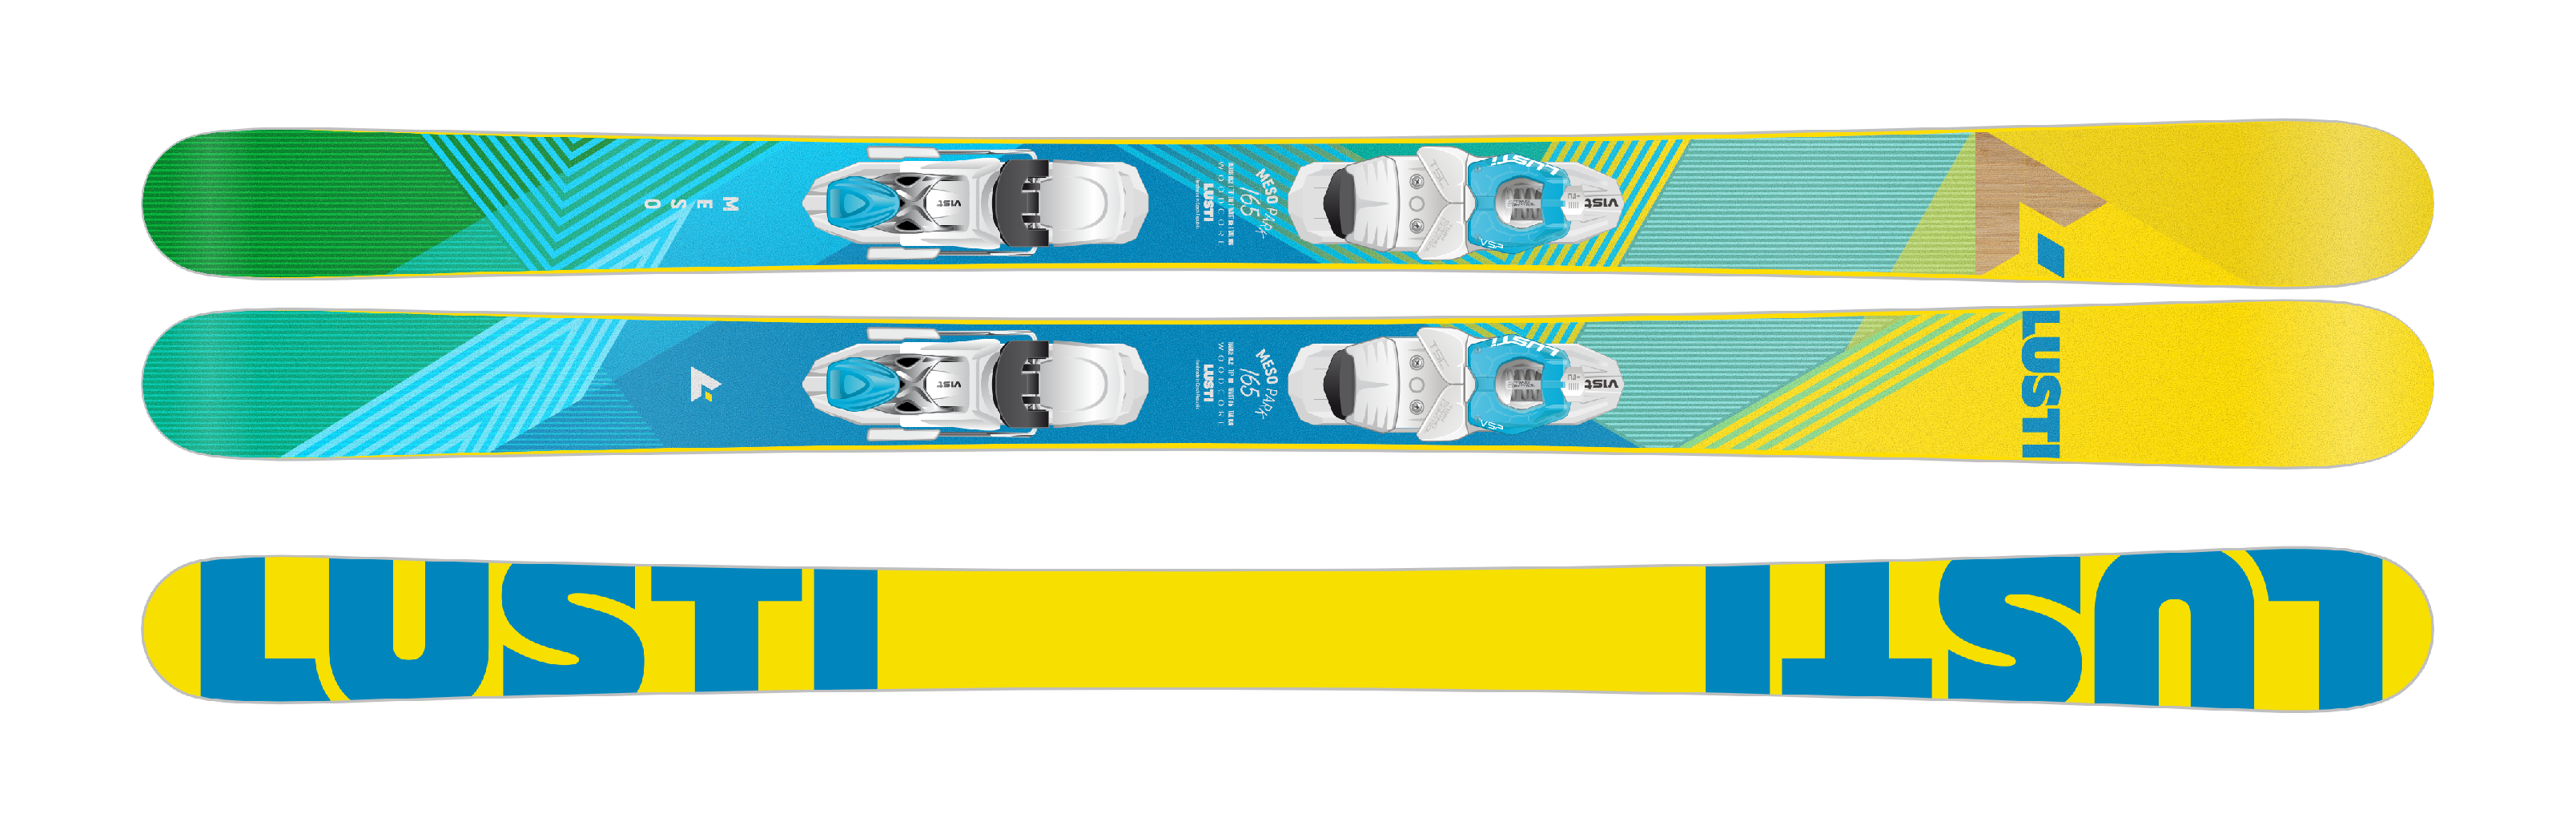 LUSTI MESO - freestyle, 155 cm, 2017 VIST VSP 412 + deska SPEEDSPACER